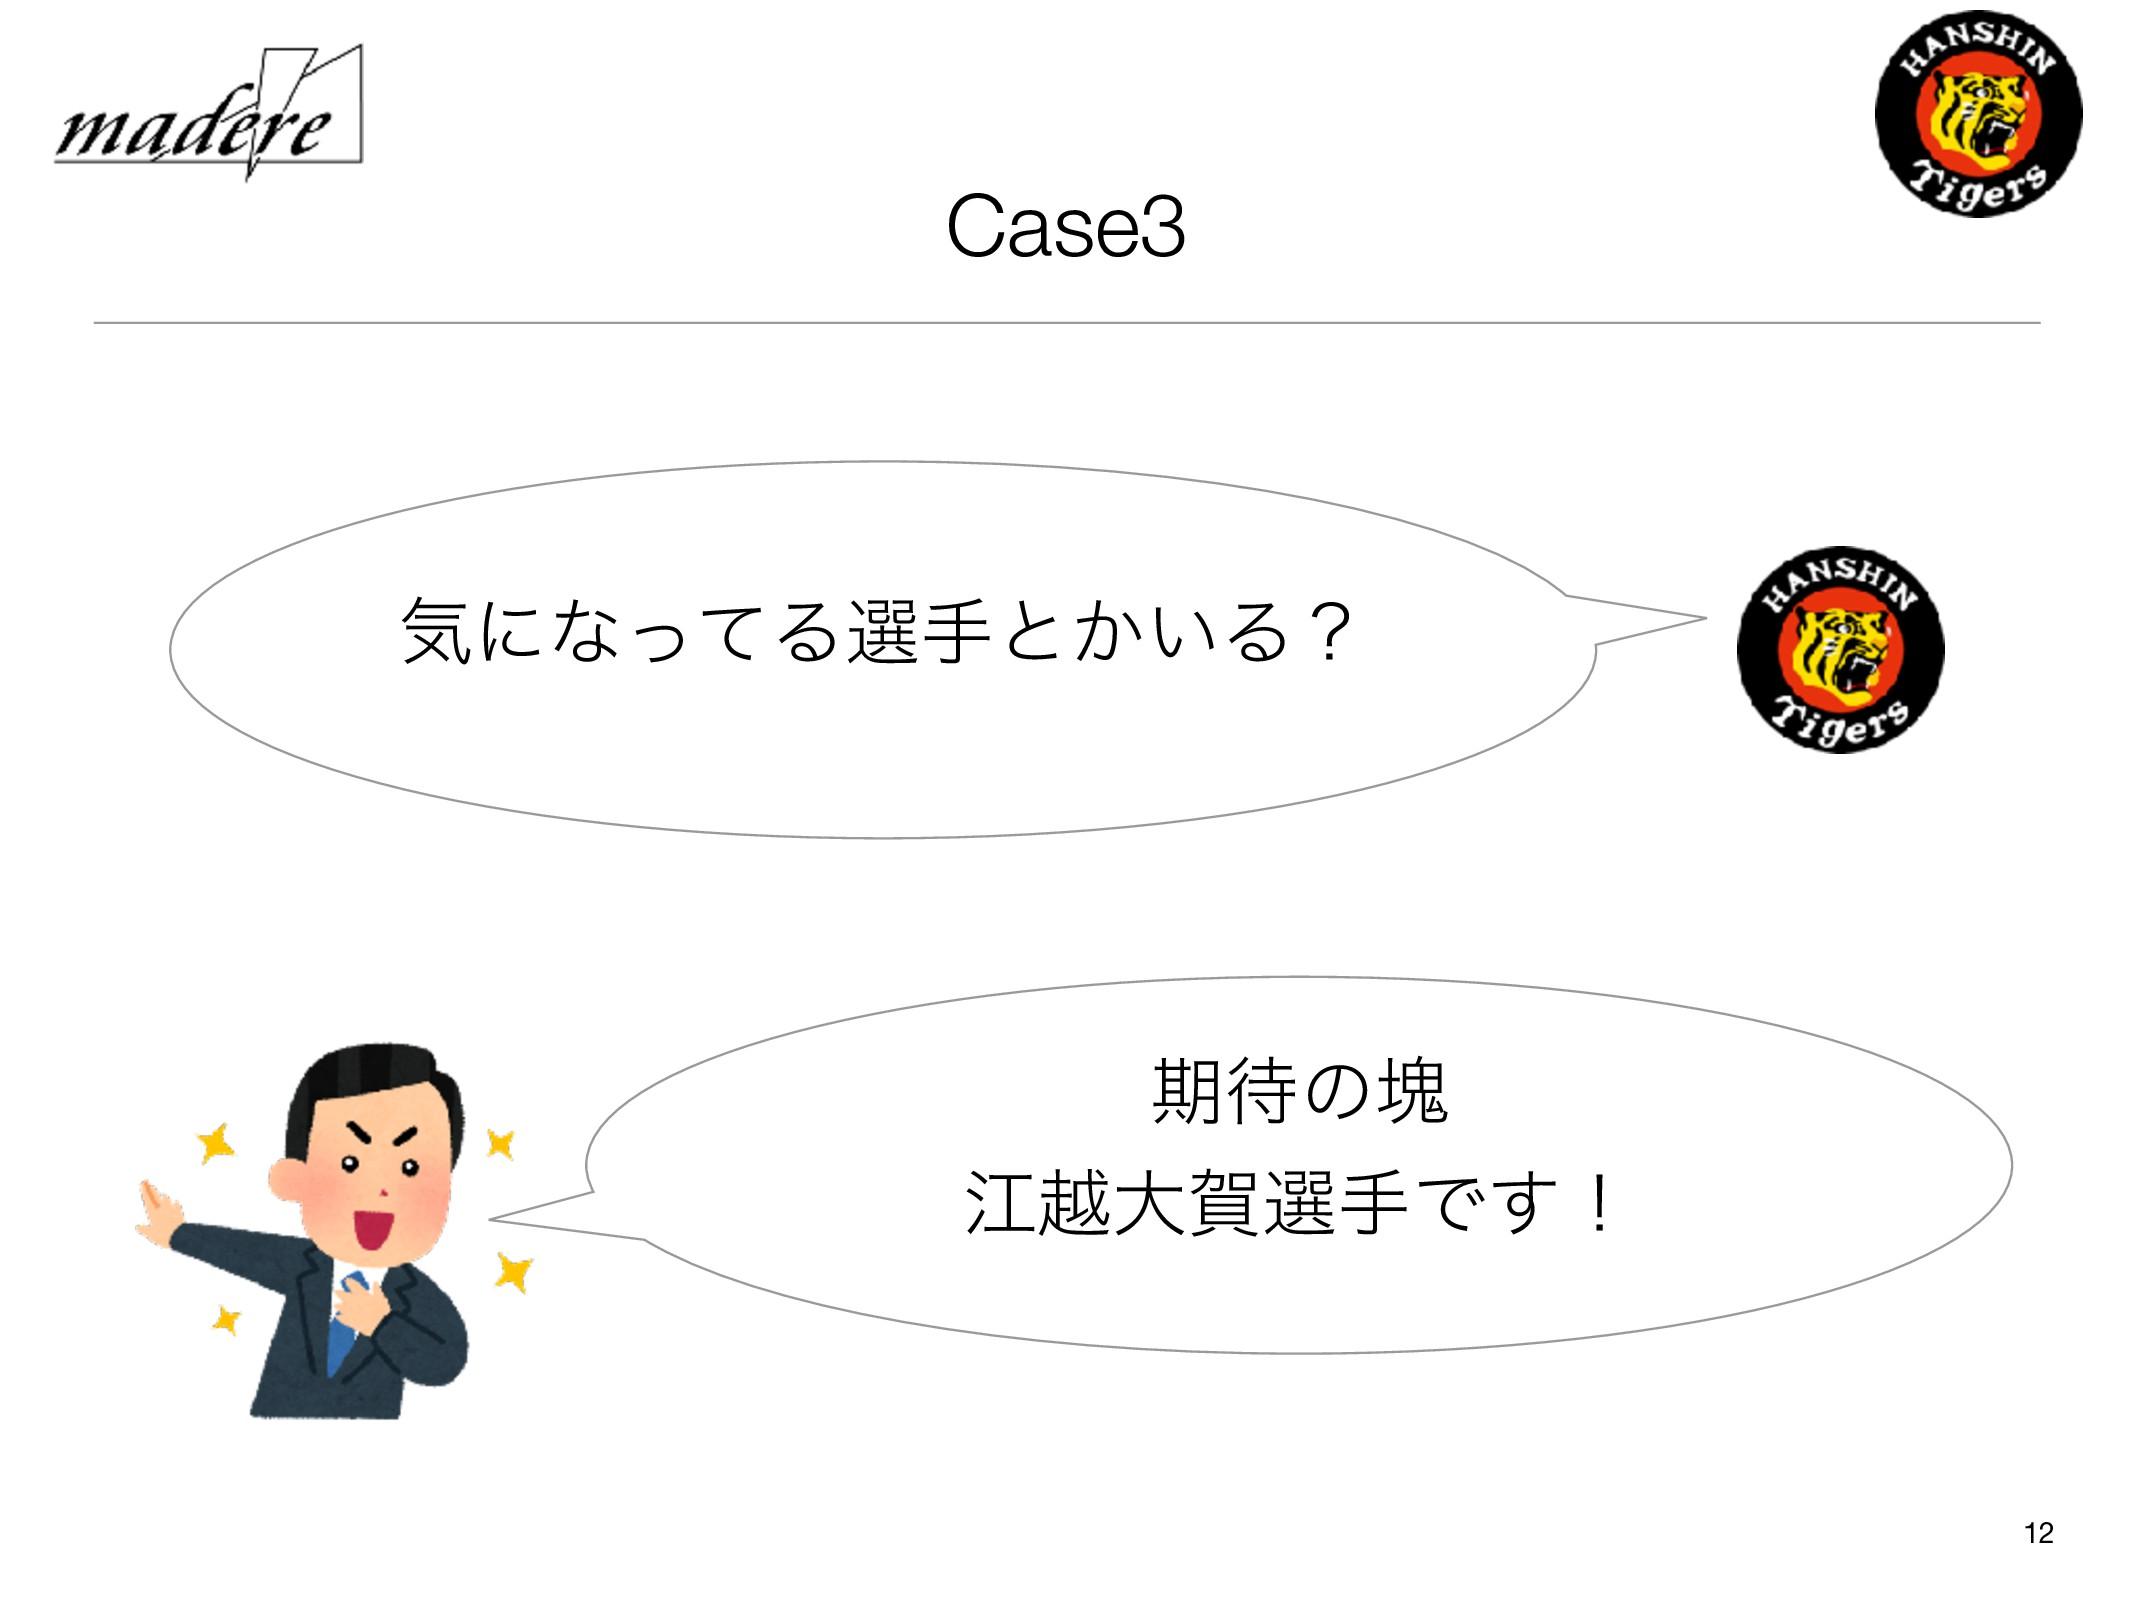 Case3 12 ؾʹͳͬͯΔબखͱ͔͍Δʁ ظͷմ ߐӽେլબखͰ͢ʂ